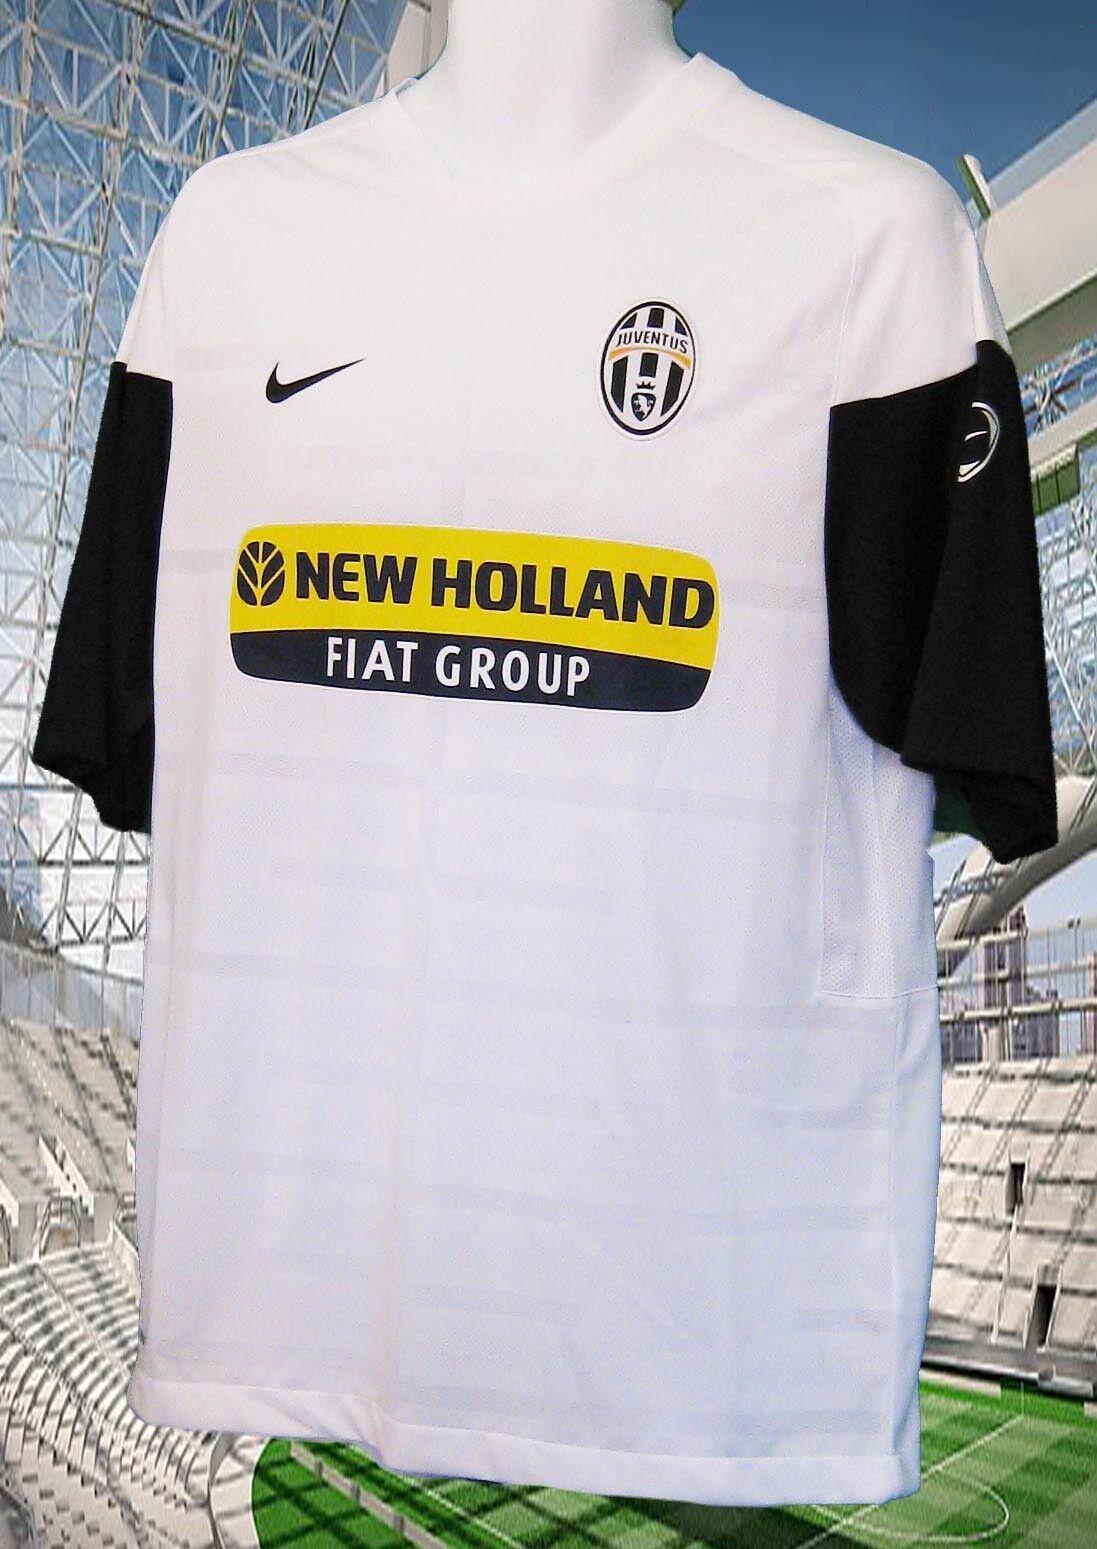 NIKE JUVENTUS FOOTBALL Training Pre Match Shirt New Holland White M